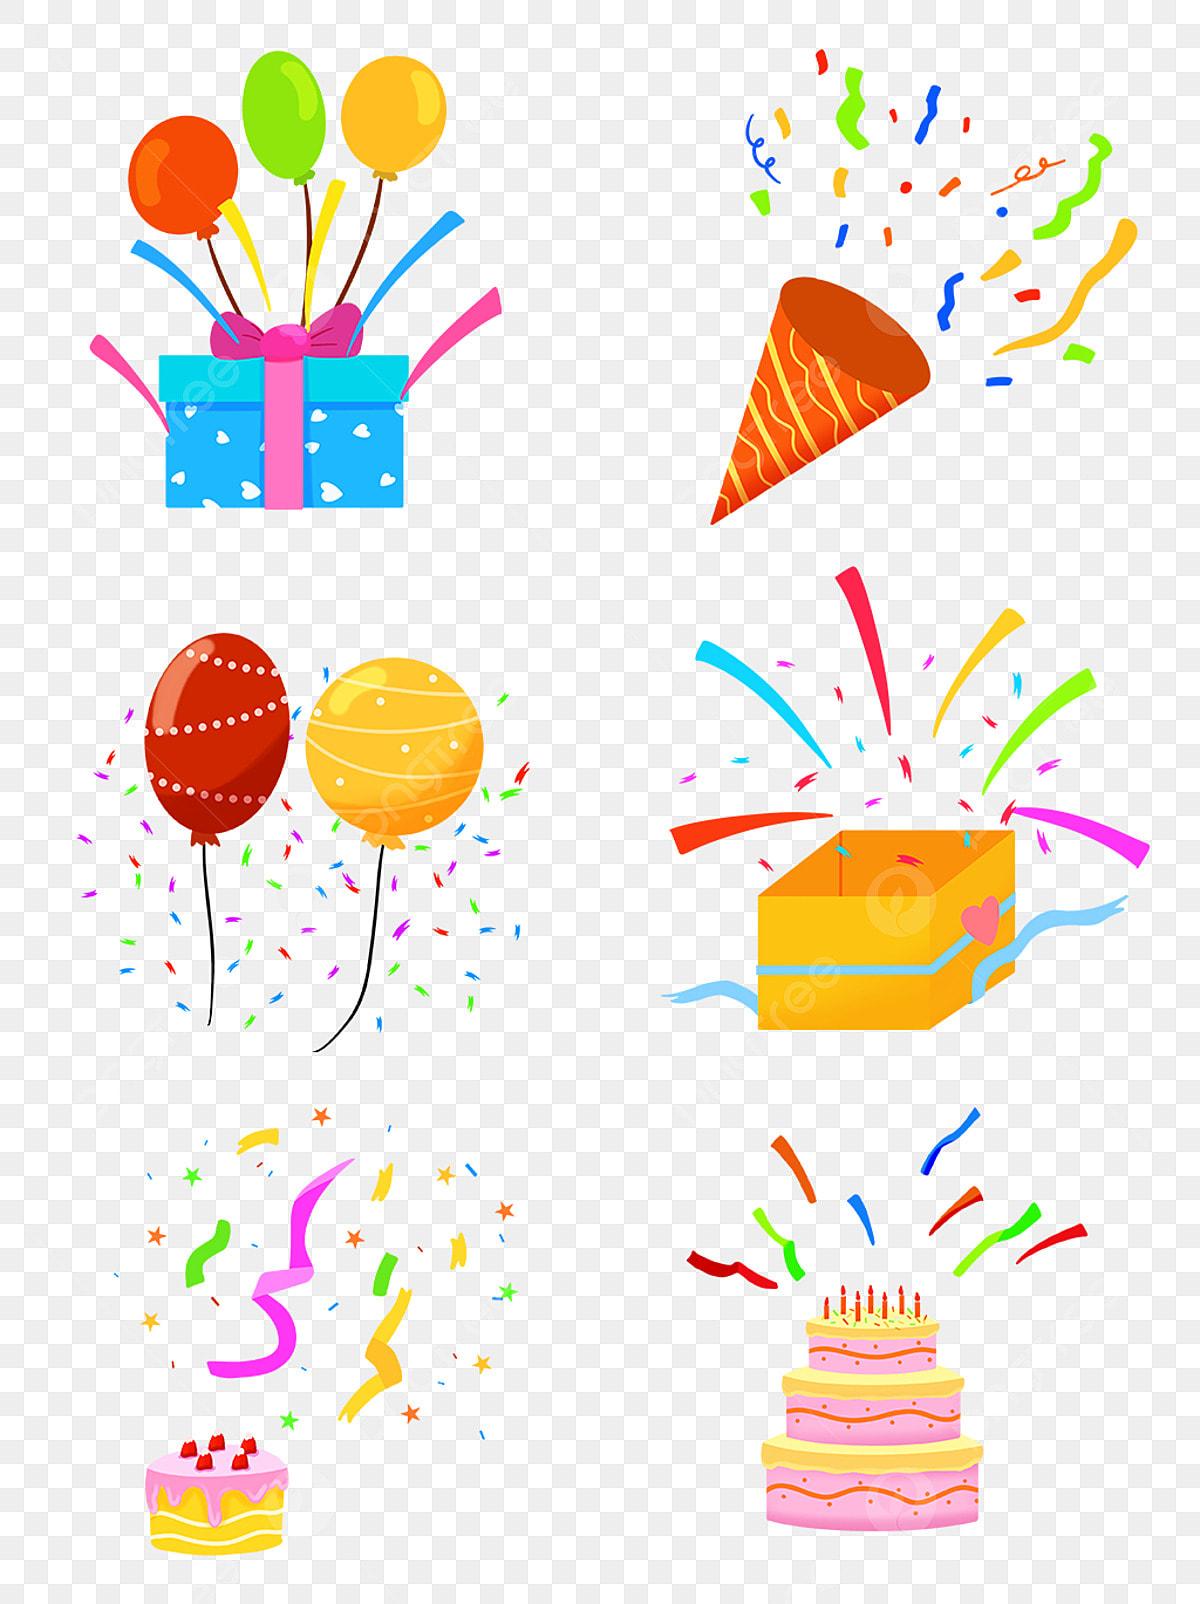 Fireworks Balloon Birthday Cake Gift Box Ribbon Combination